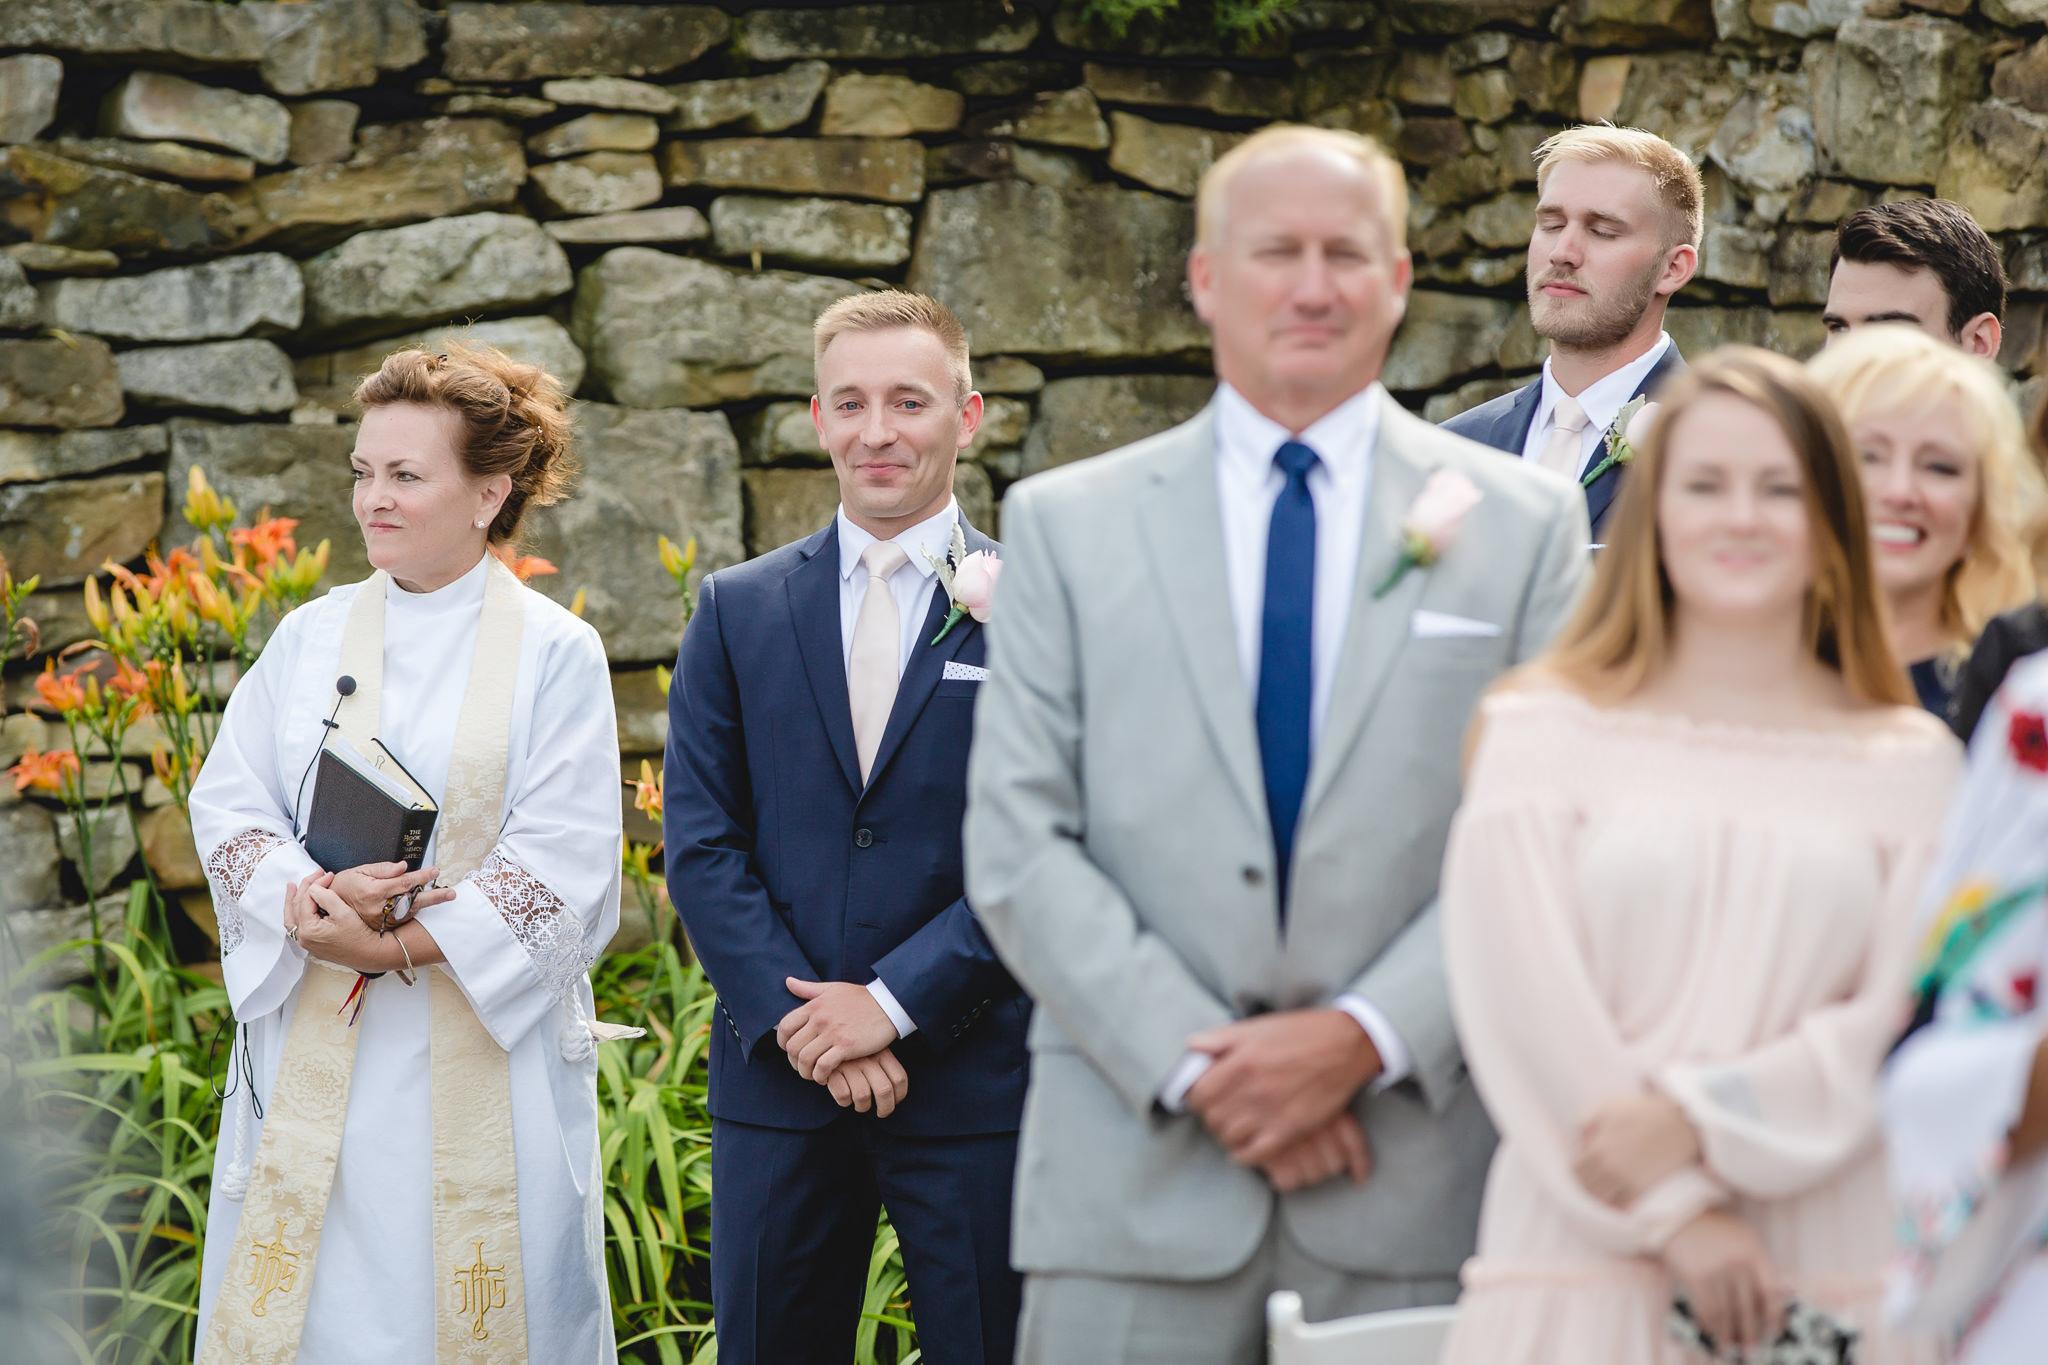 Groom gets emotional at his outdoor wedding ceremony at Hidden Valley Resort